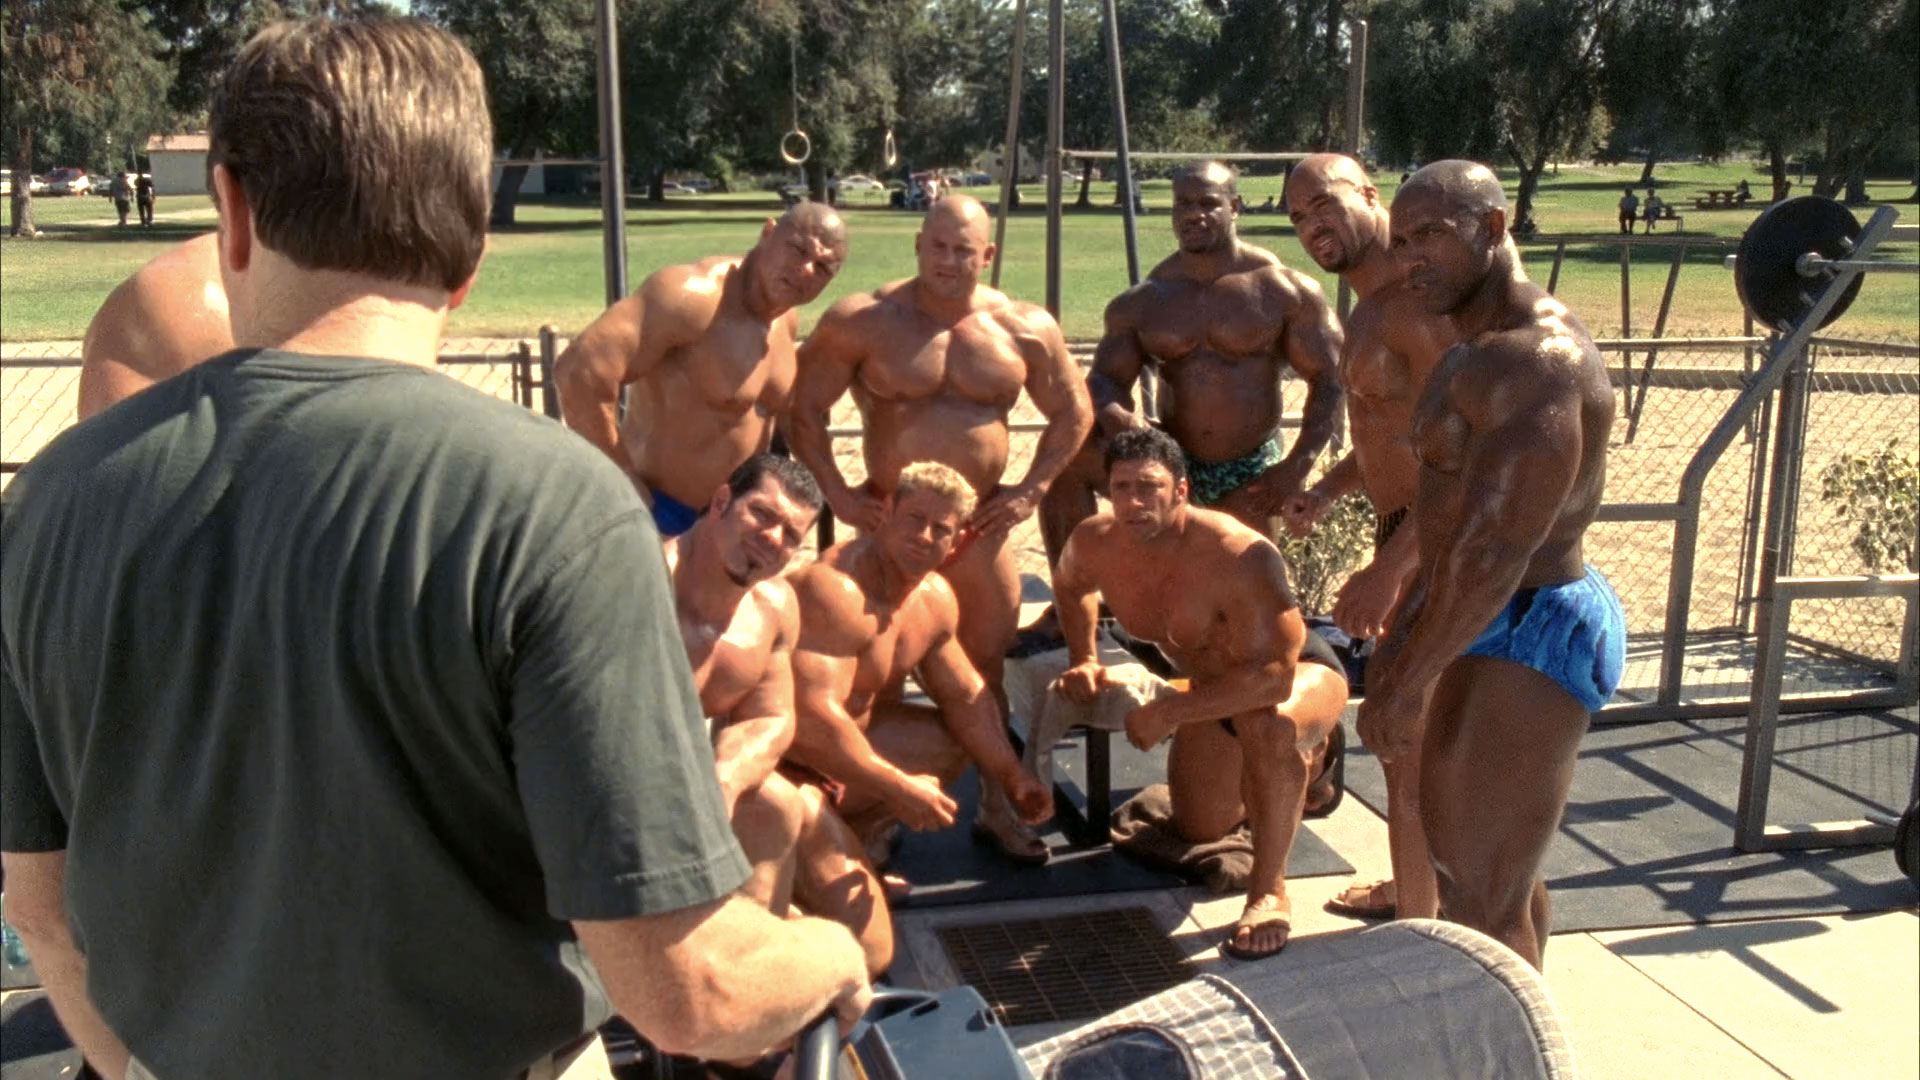 Bryan Cranston (Hal), Bob Cicherillo (Walt), Aaron Brumfield (bodybuilder #1),   Rich Piana (bodybuilder #2), Mariano 'Big Dawg' Mendoza (bodybuilder #2 (non crédité)) et Christian Boeving (non crédité) dans